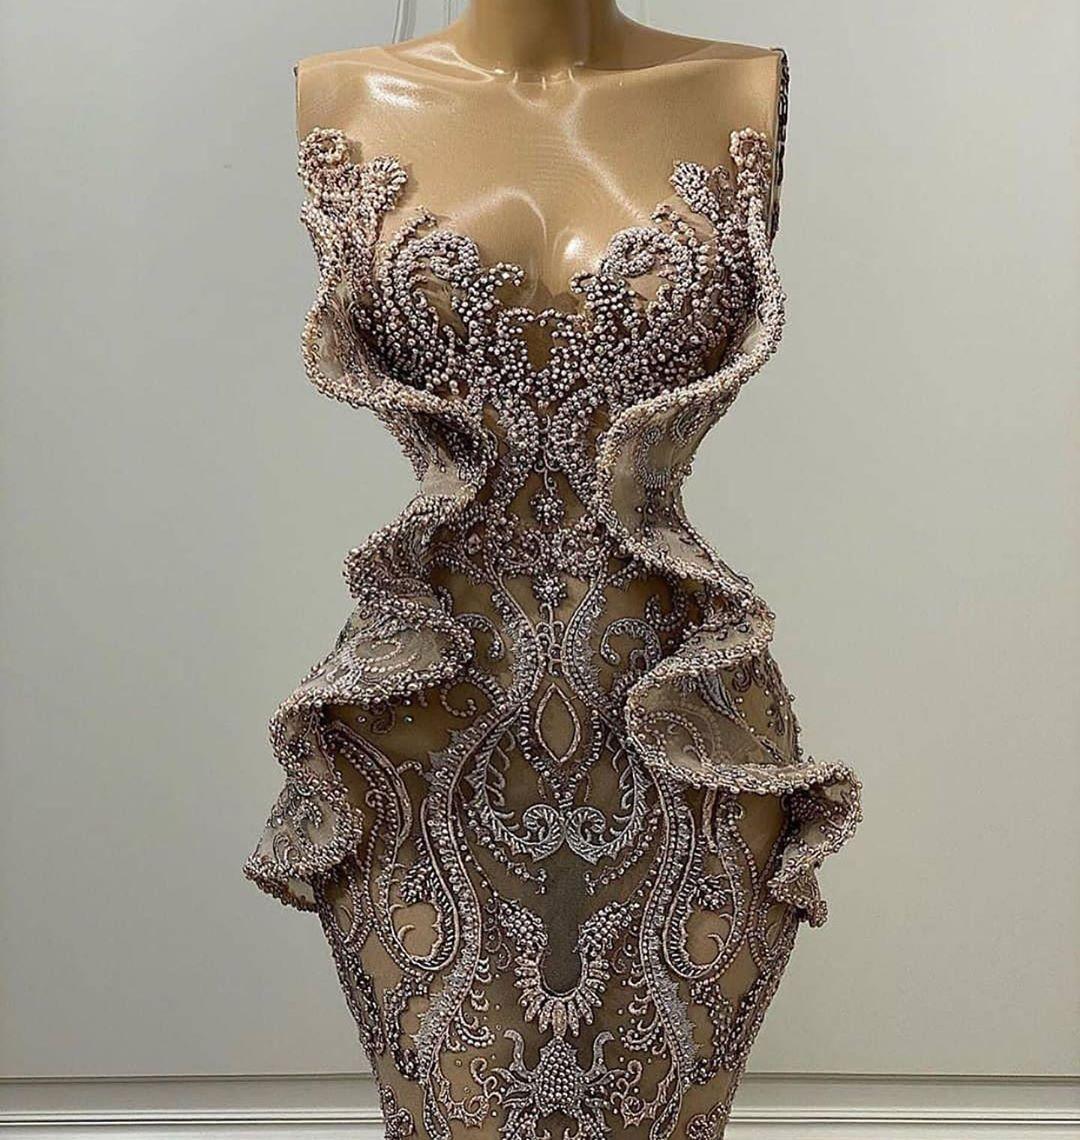 "Ahoufe Bridal ® on Instagram: ""#AhoufeReceptionDressInspo 💕 Dress @lumnijekrasniqiofficial • • • • • • • • • • • • #ahoufebridal #coutureaddict #couturedress…"""